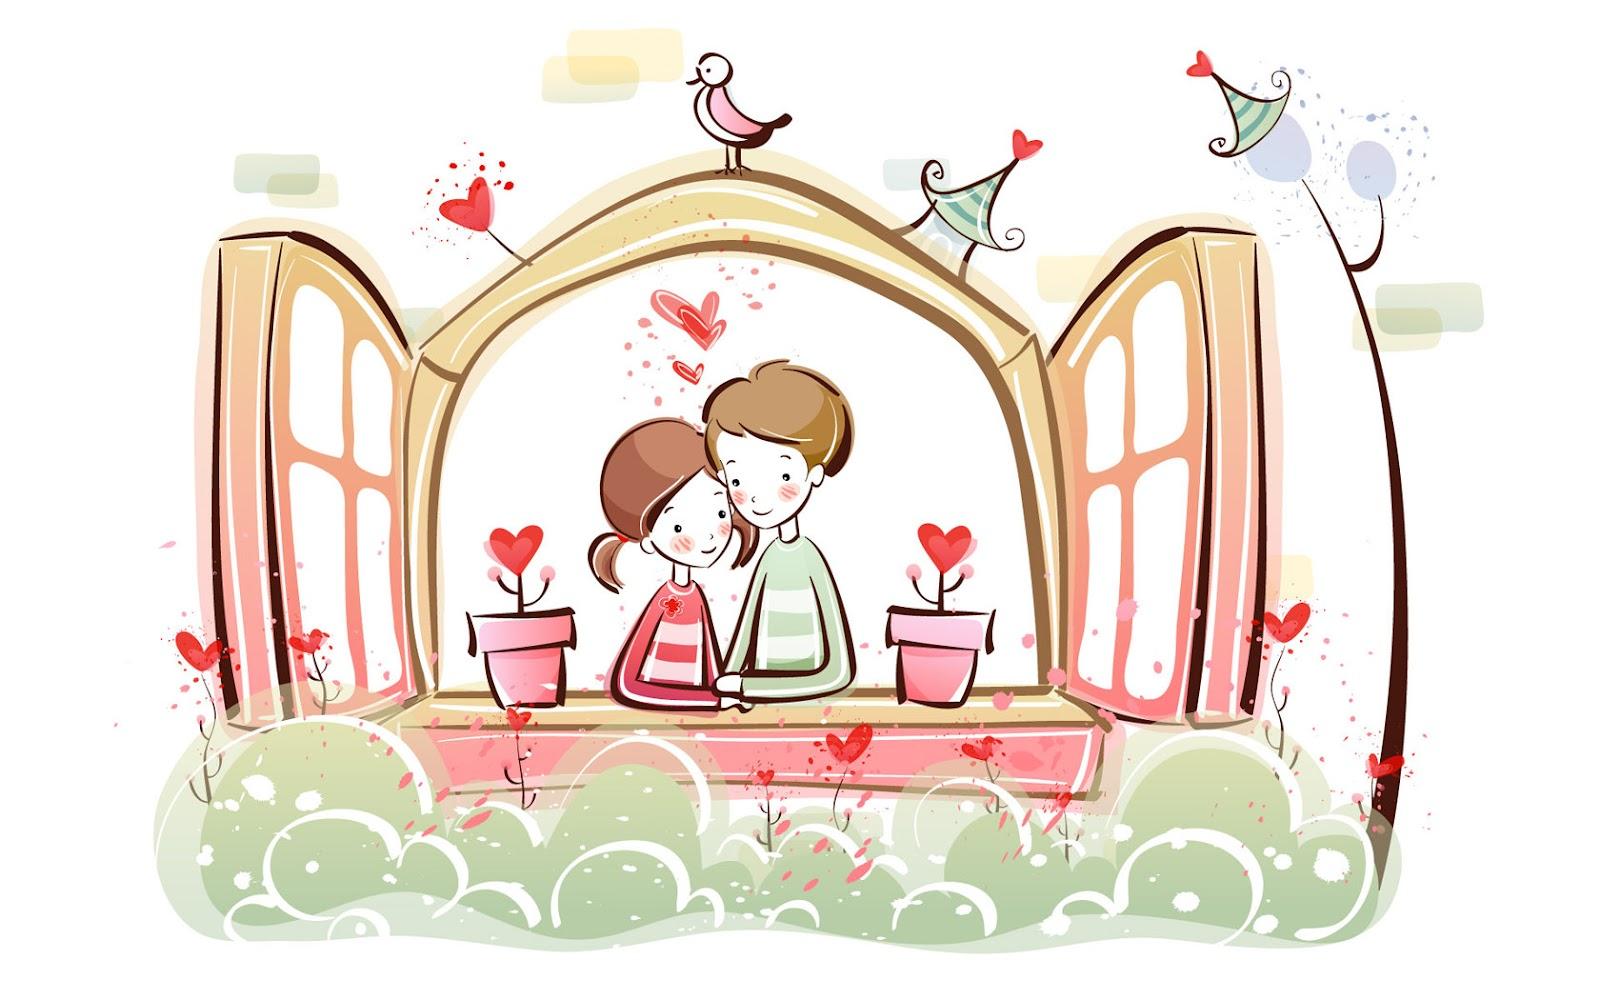 ✓ Terbaru Gambar Kartun Romantis Hd